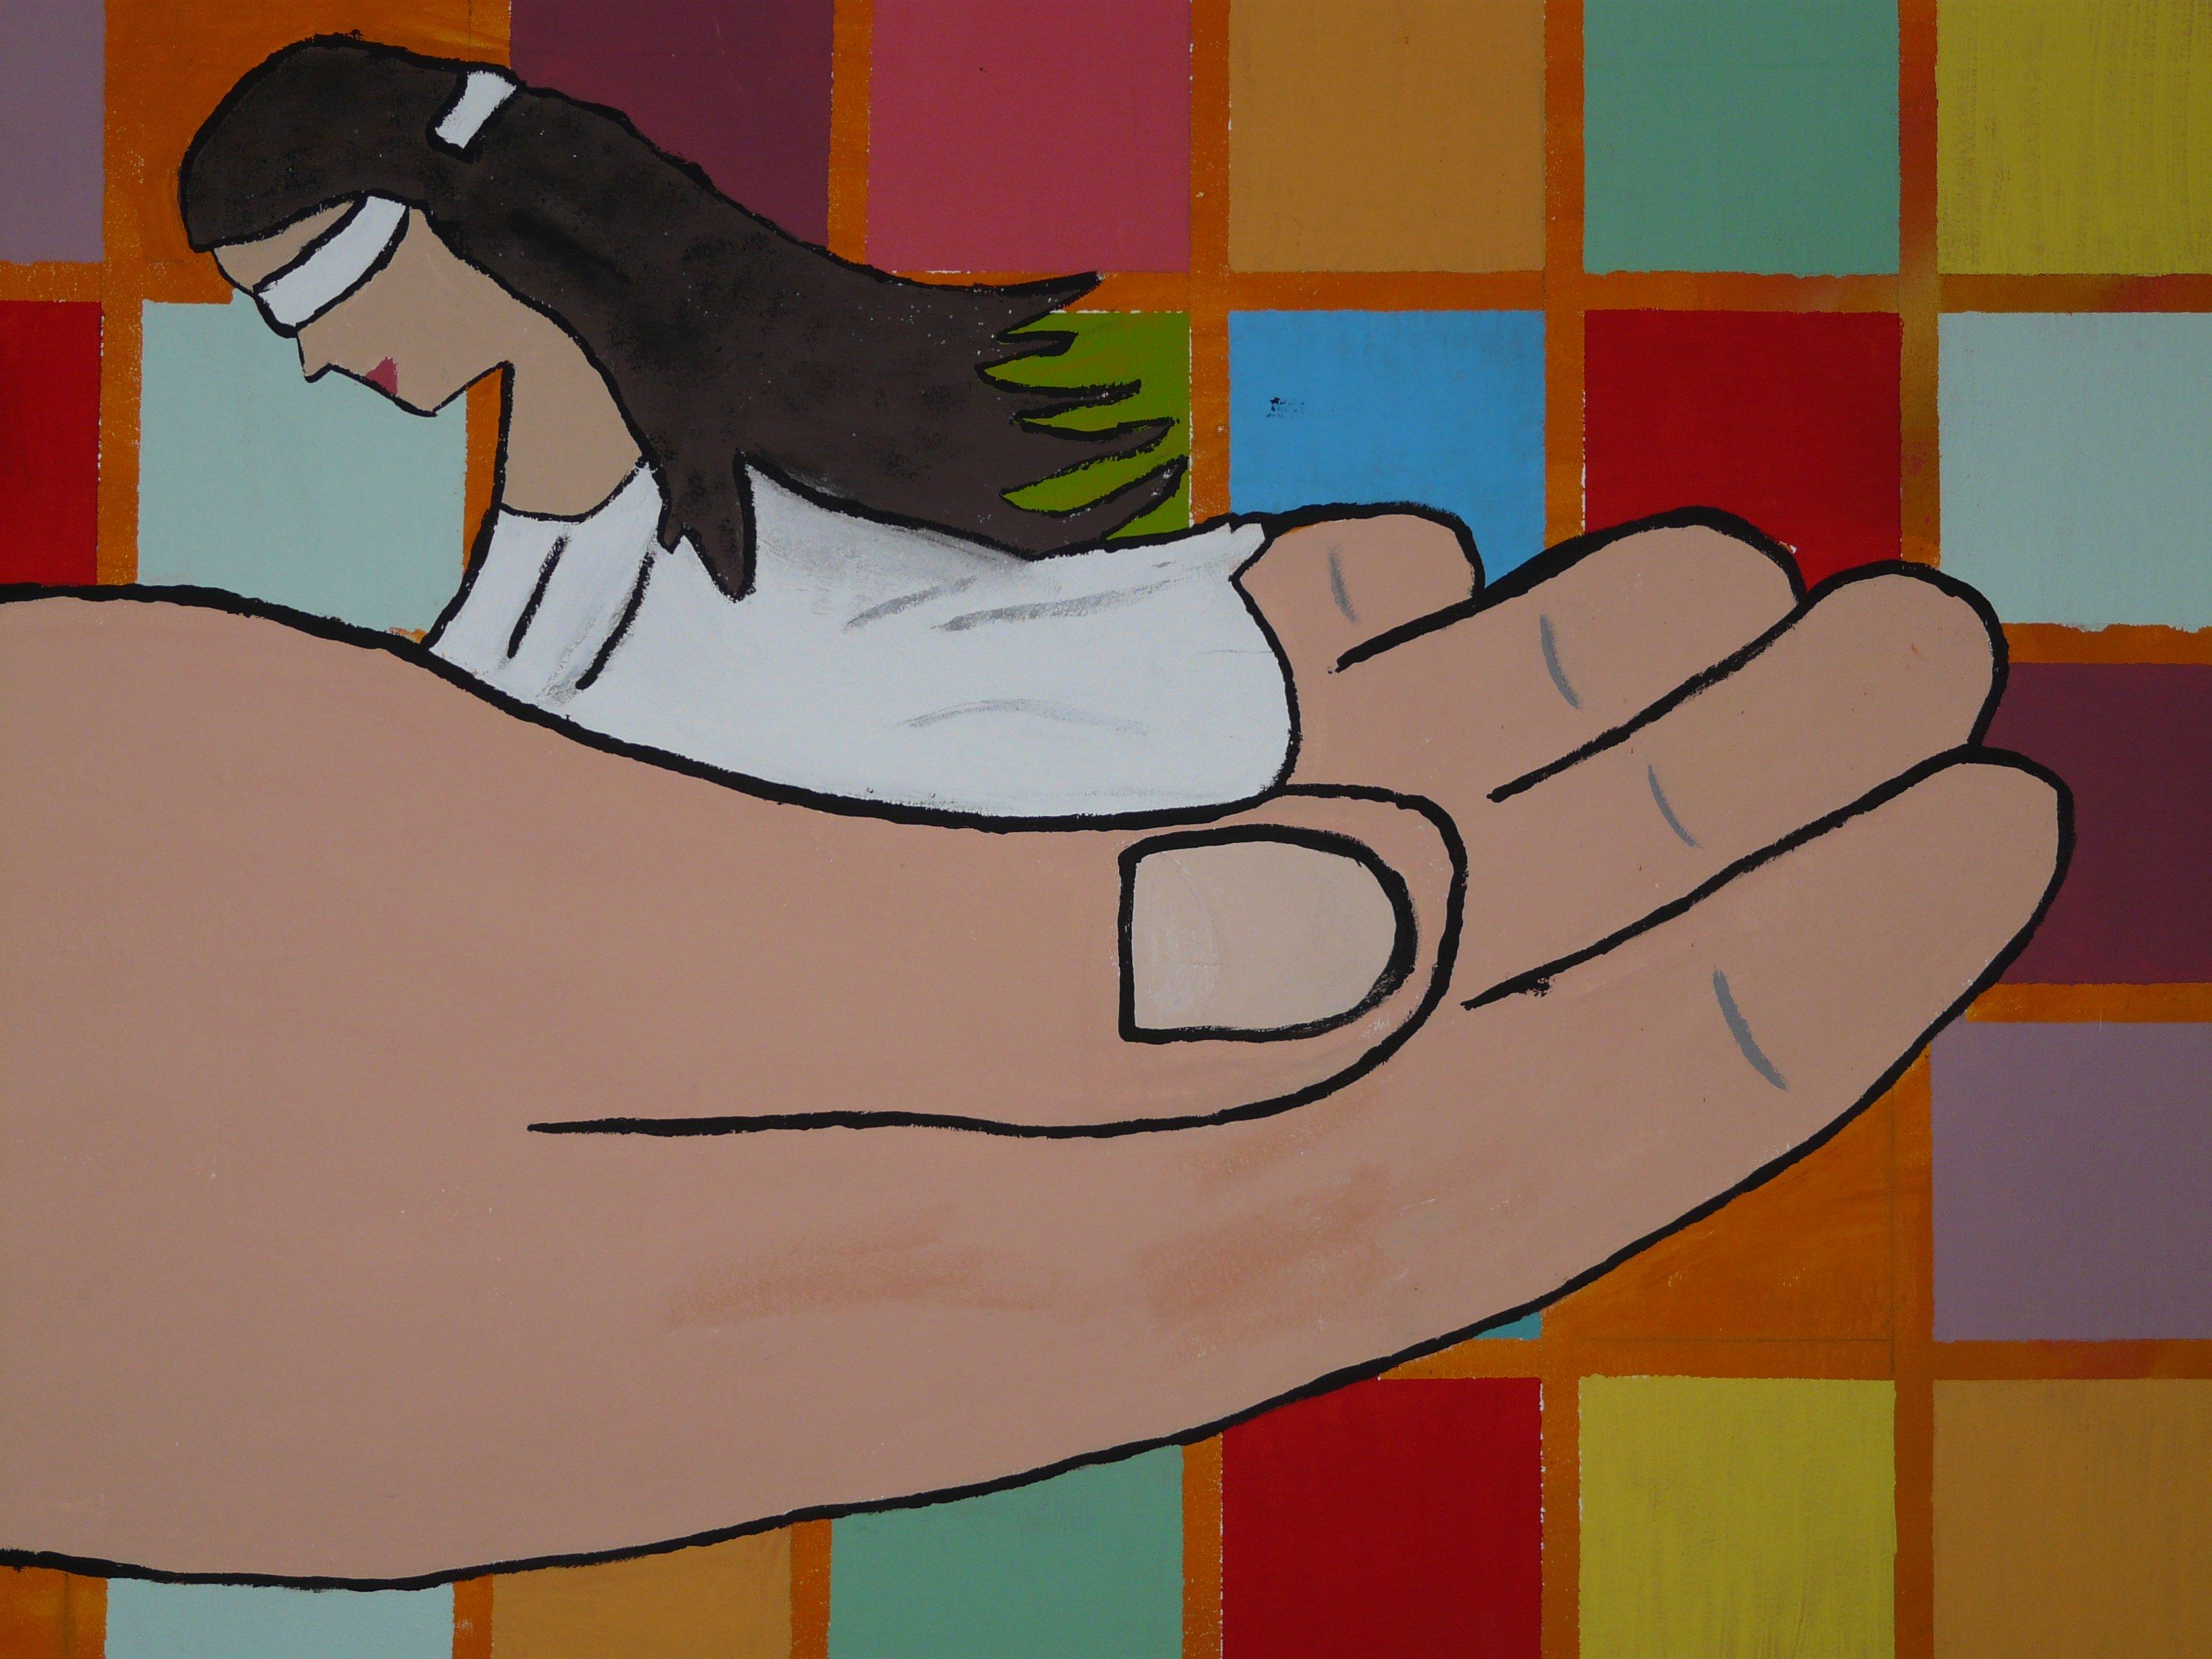 Gambar Tangan Orang Abstrak Wanita Warna Tubuh Manusia Seni